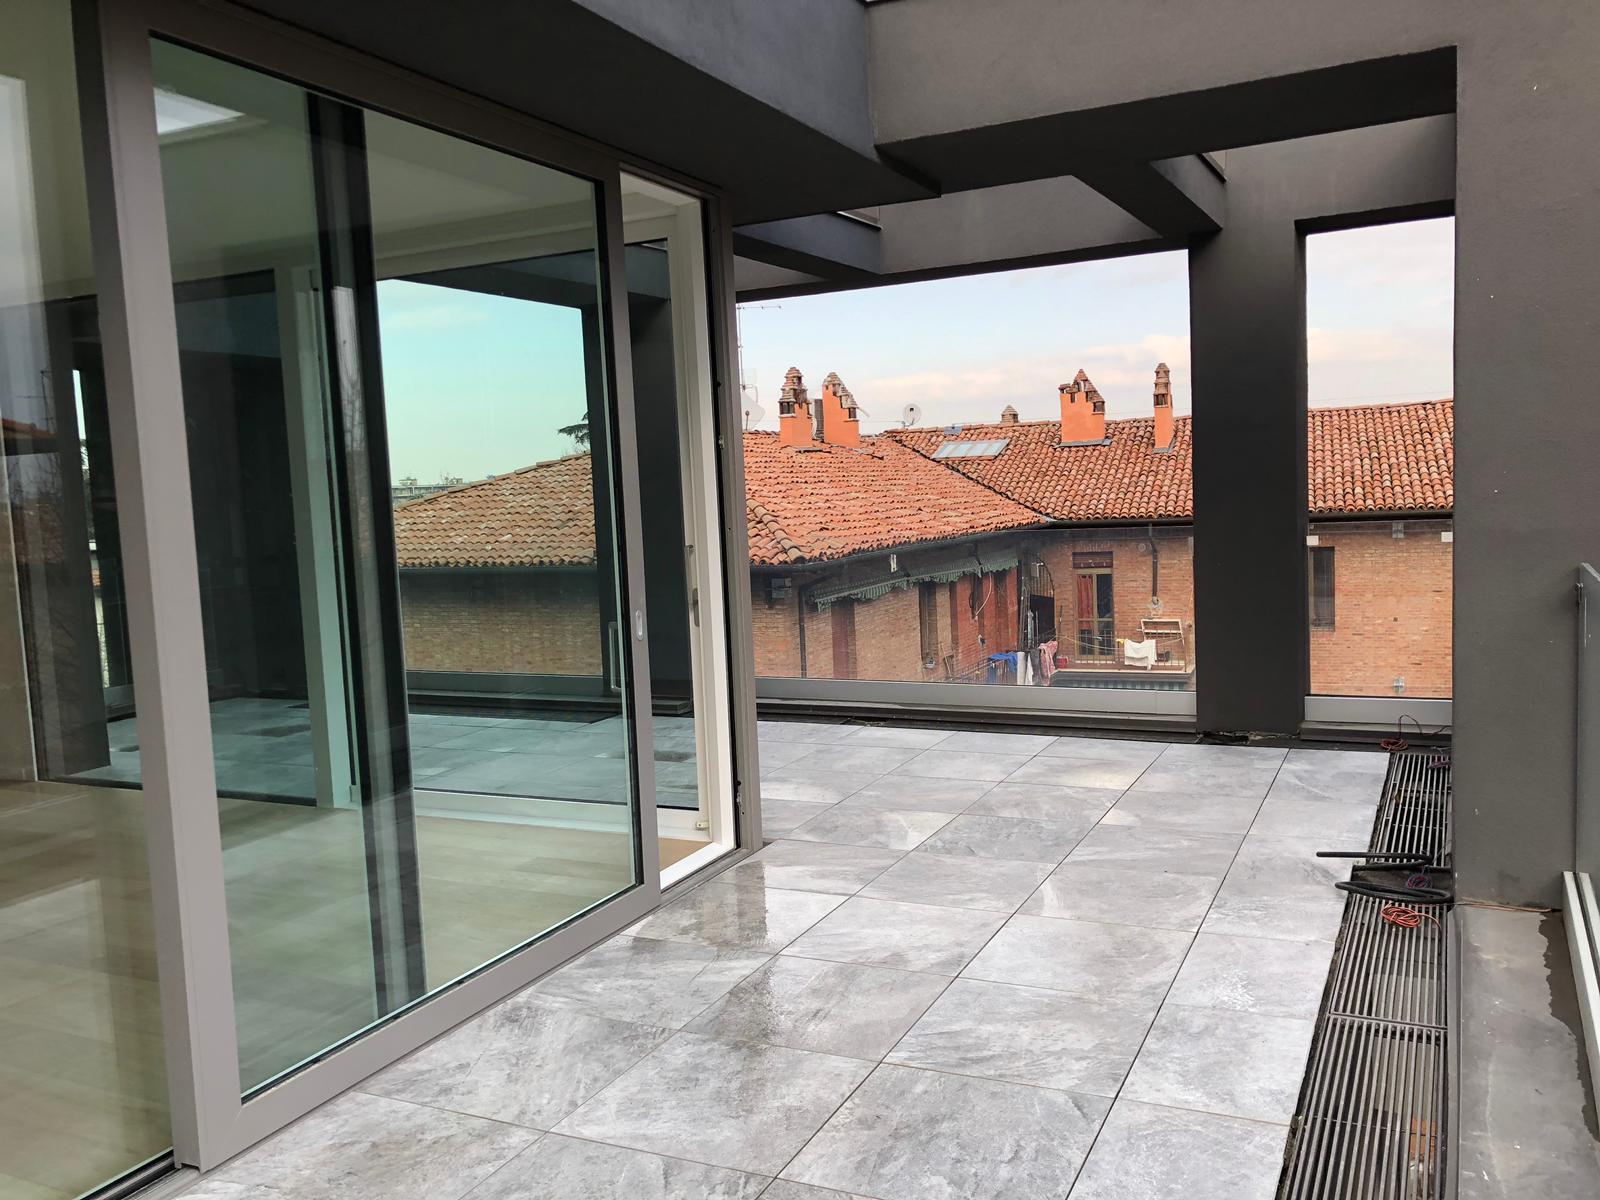 Via Masi,Bologna Sud,6 Rooms Rooms,Residenziale,1126